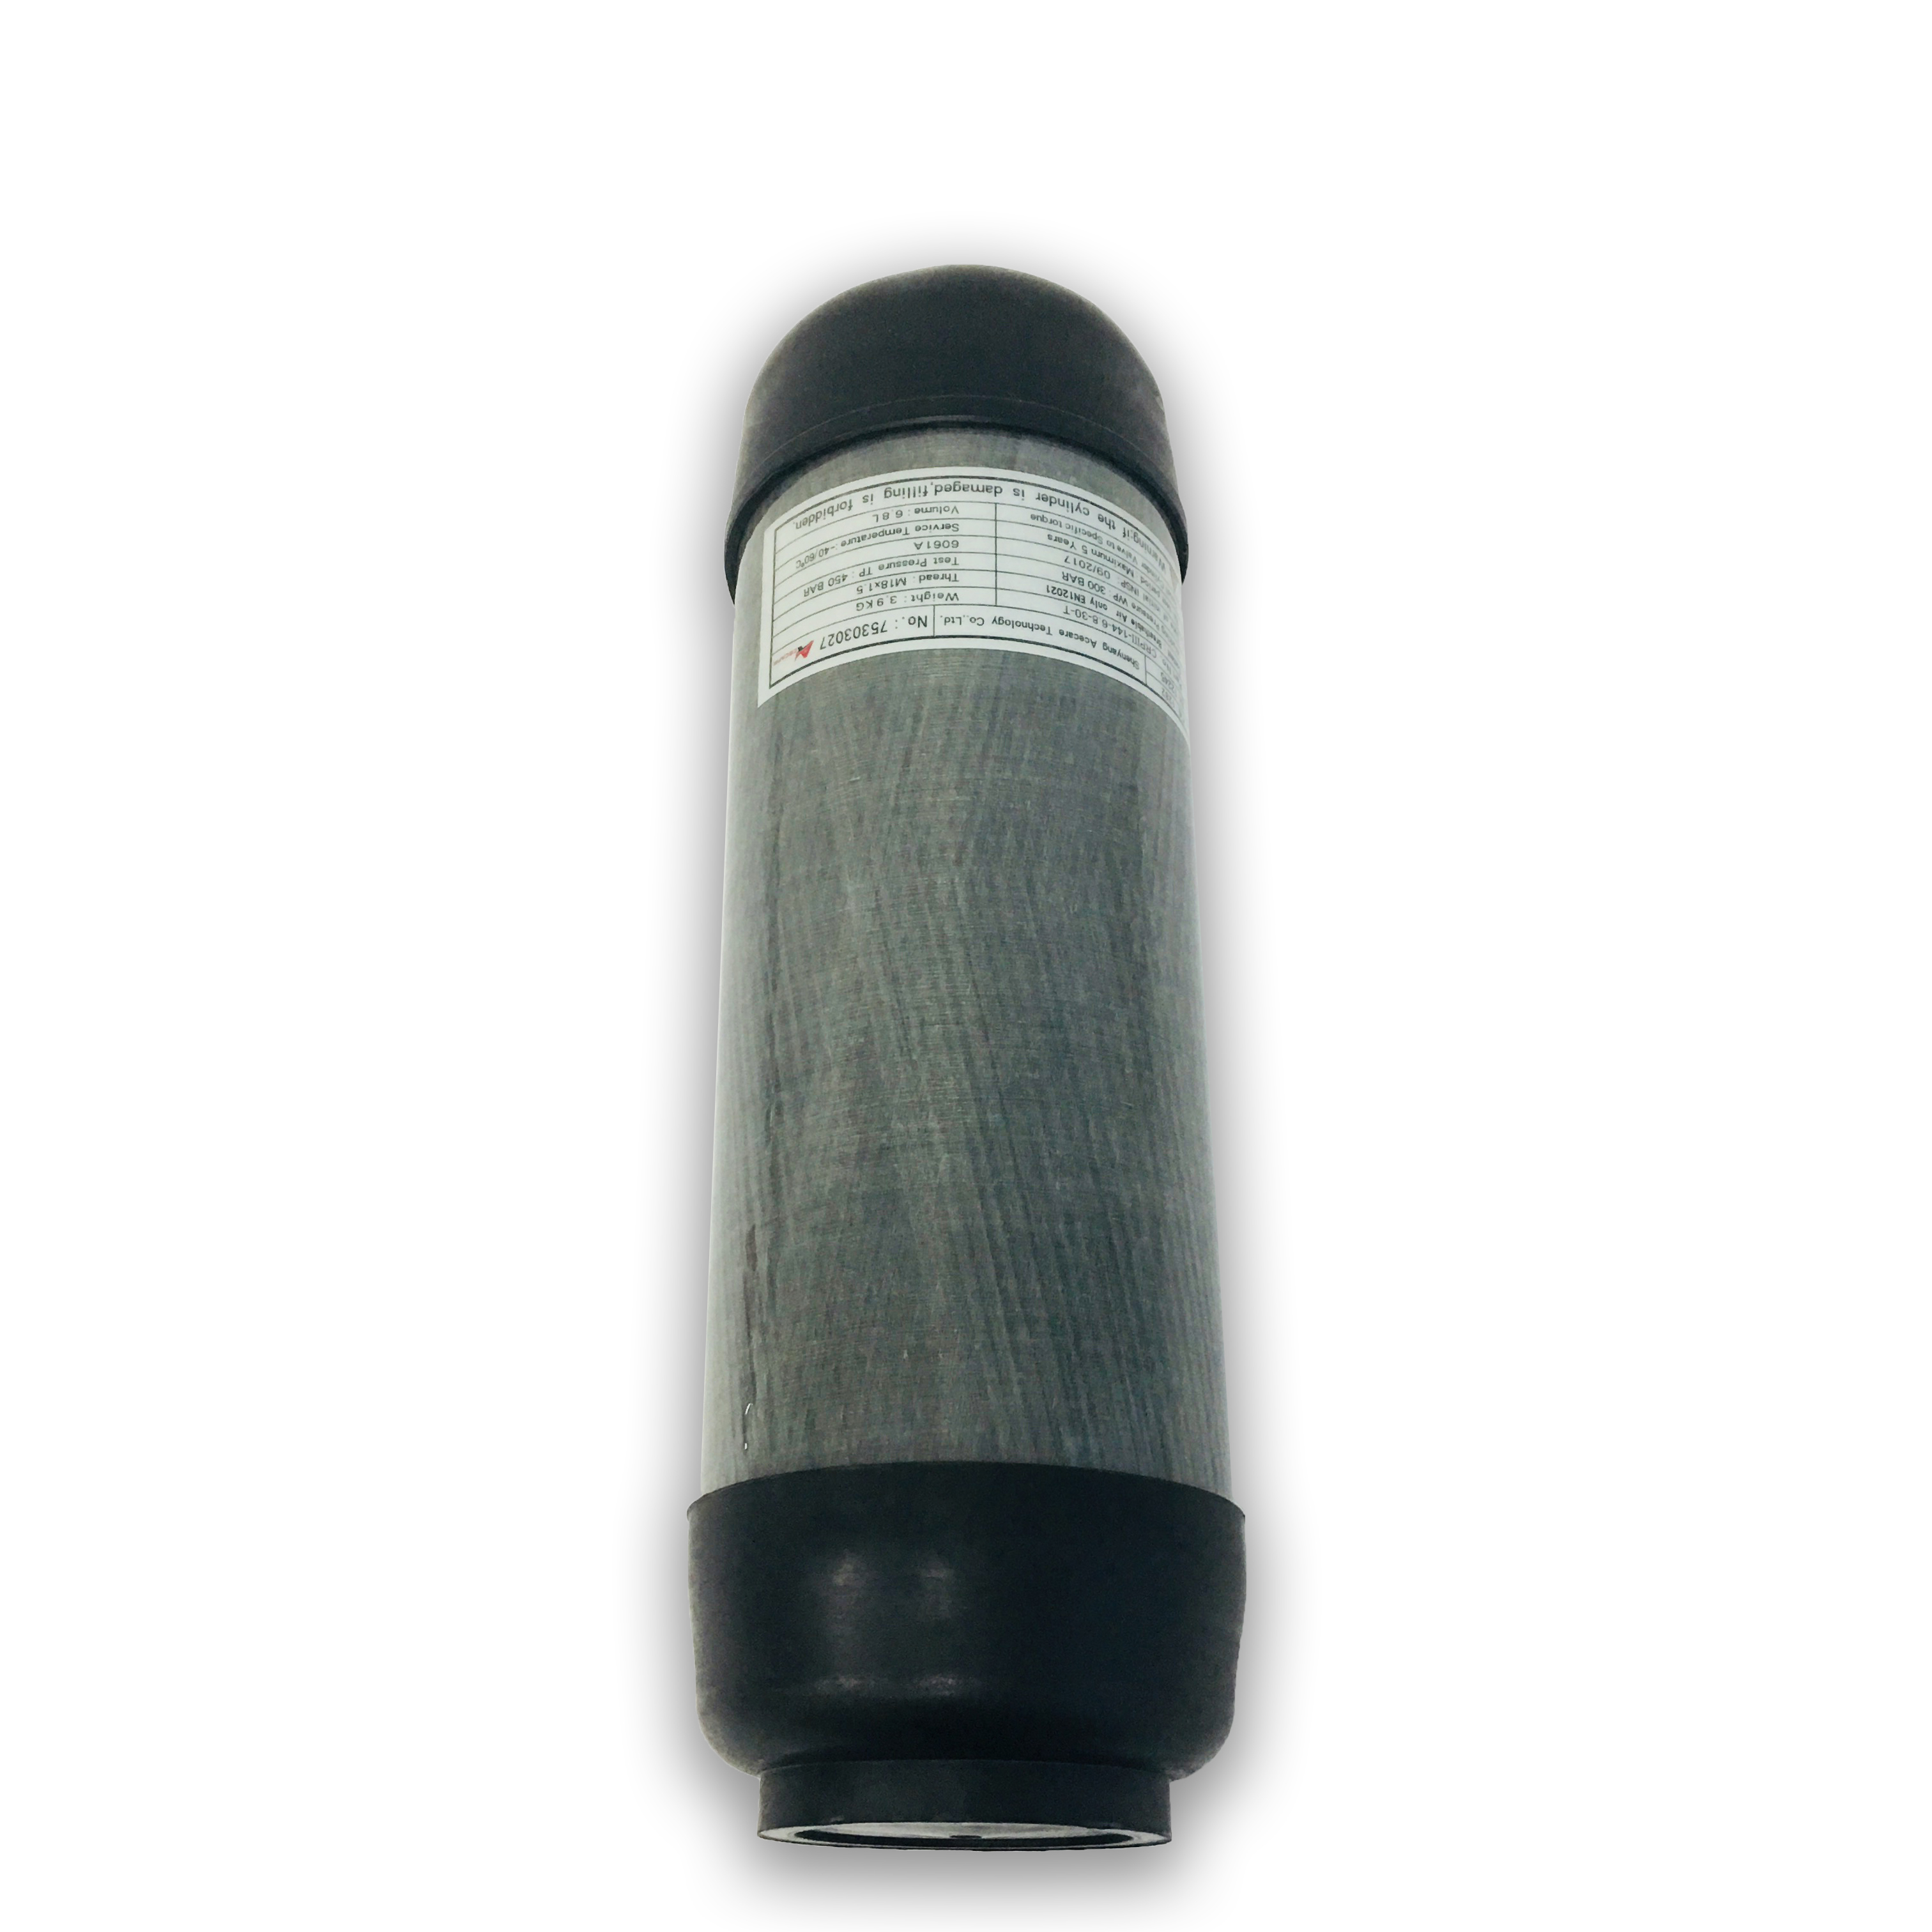 AC16891 Acecare 6.8L HPA Carbon Tank Cylinder 300Bar Pcp Rifle Air Rifle Airforce Condor Valve Scuba Diving Tank Carbon Fiber